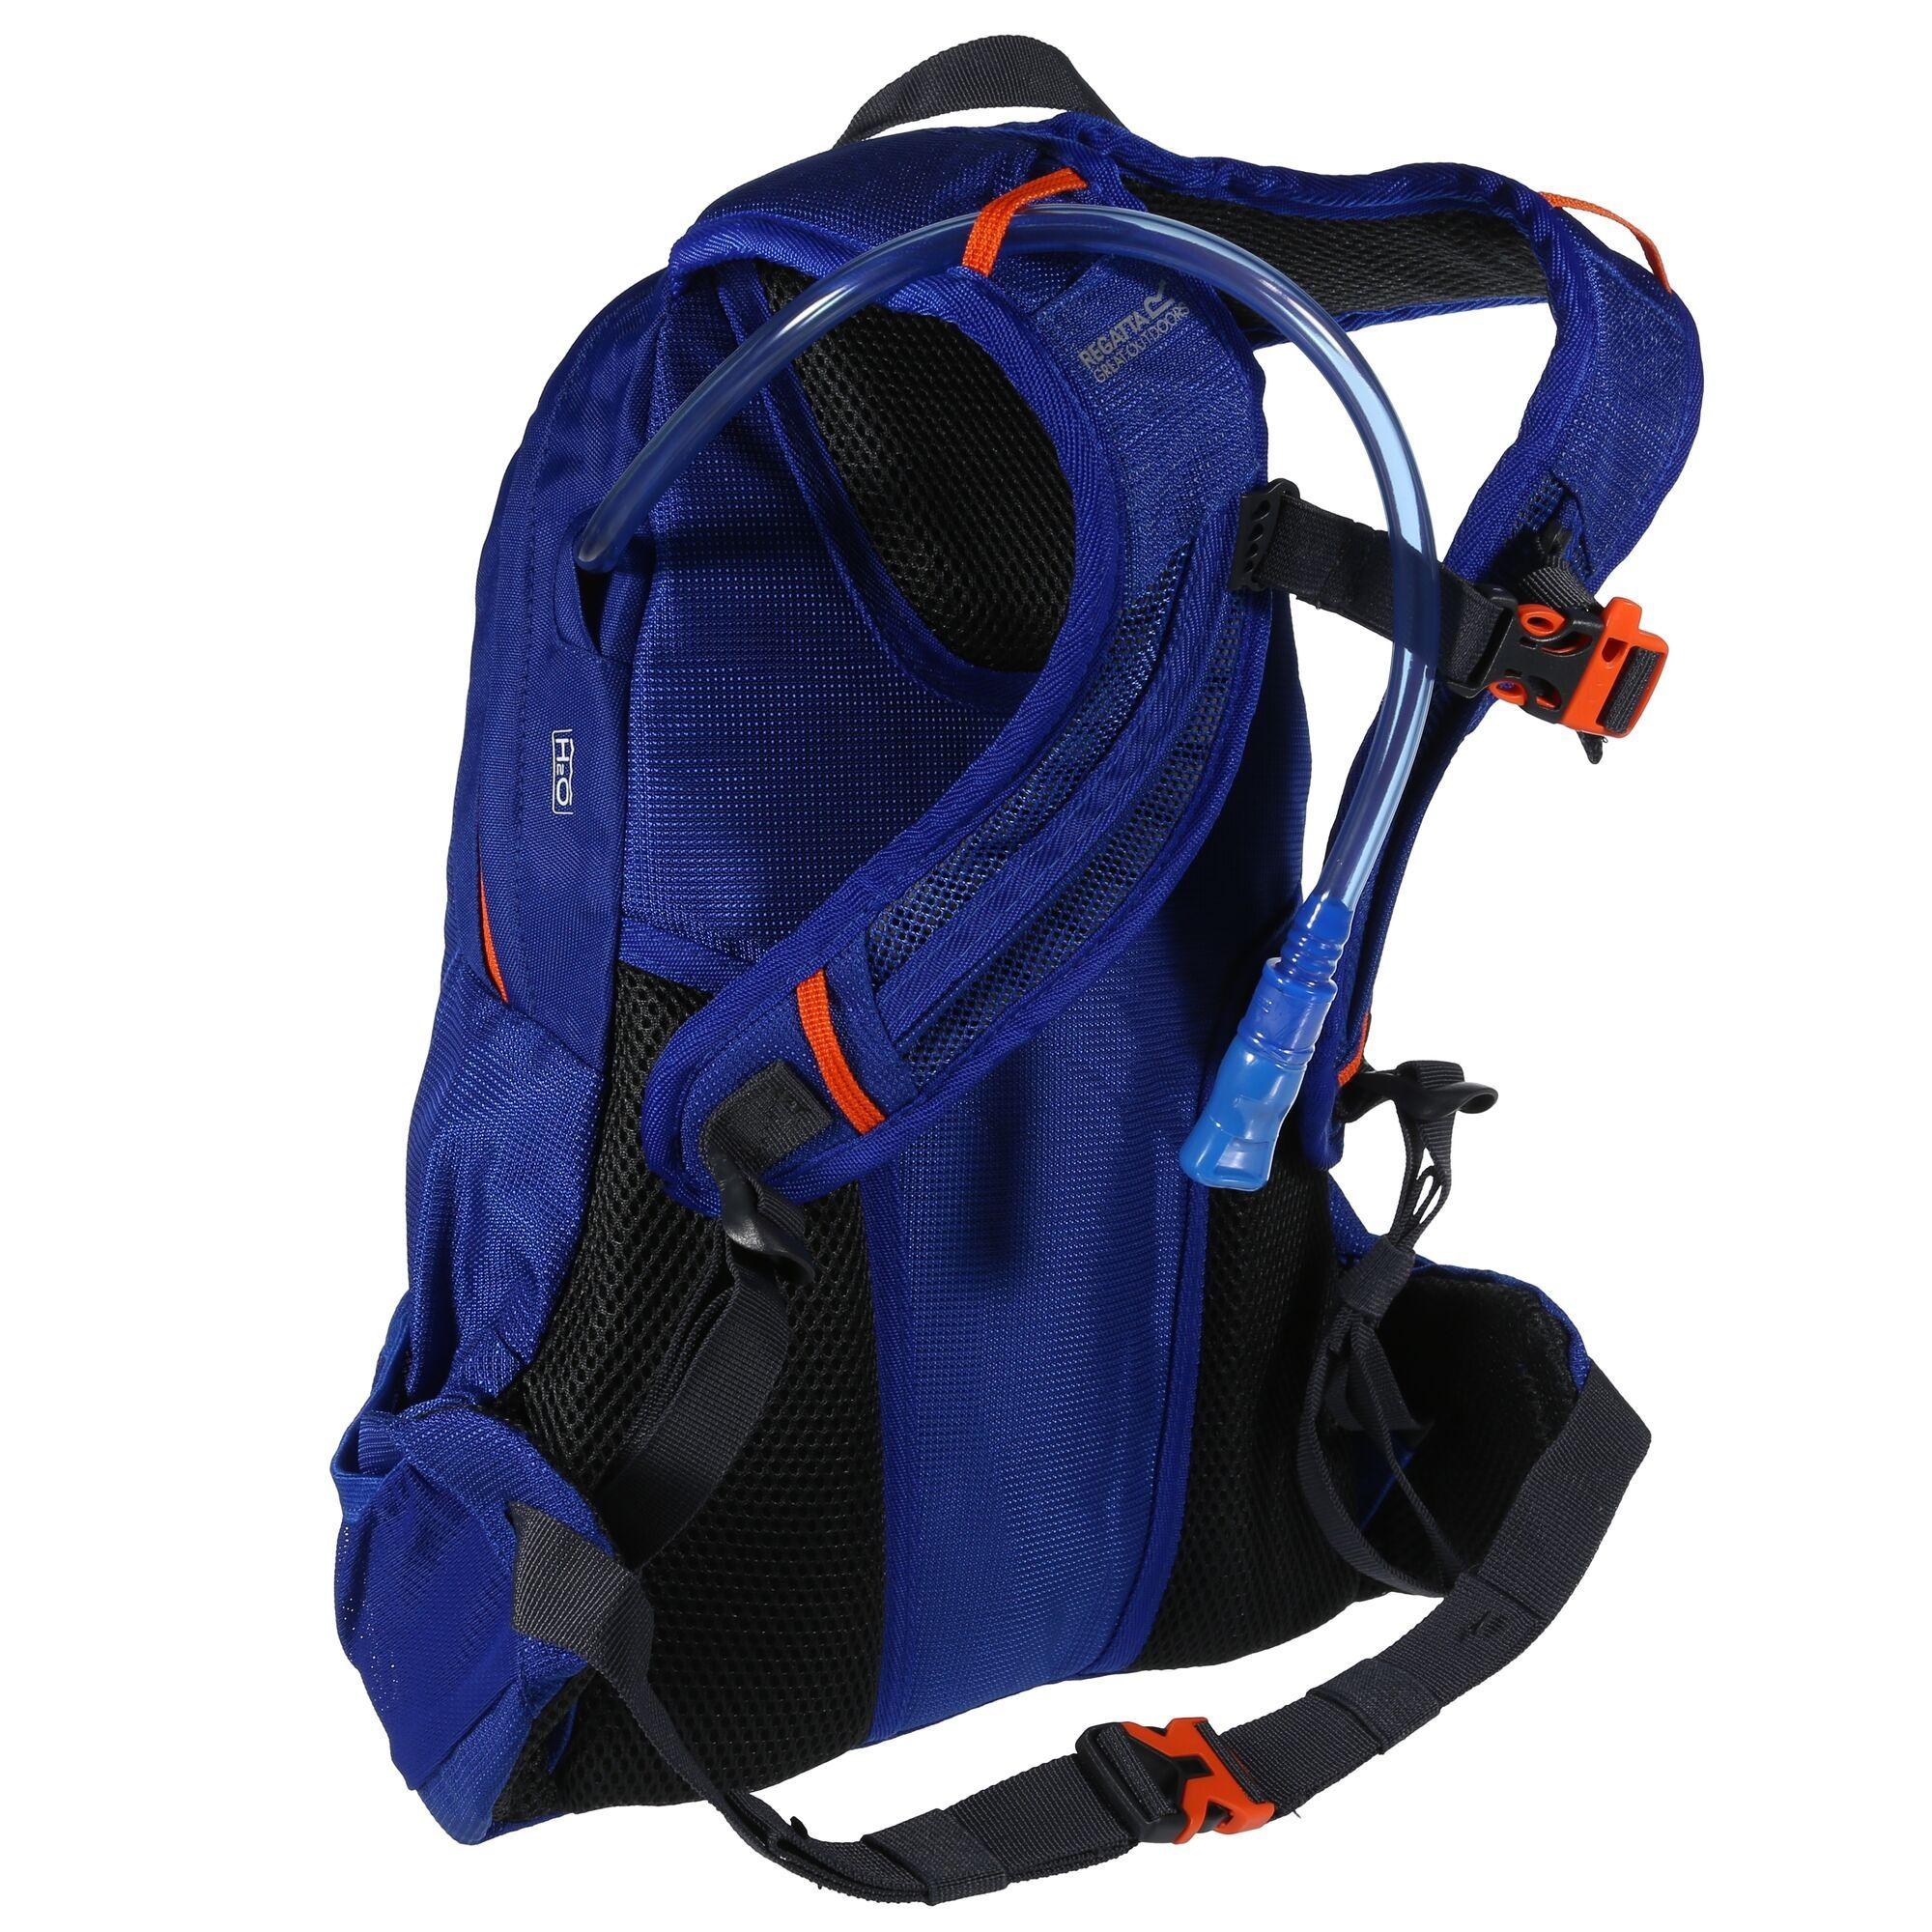 Regatta Blackfell III 20L Hydropack Rucksack (Surfspray Blue/Blaze Orange)